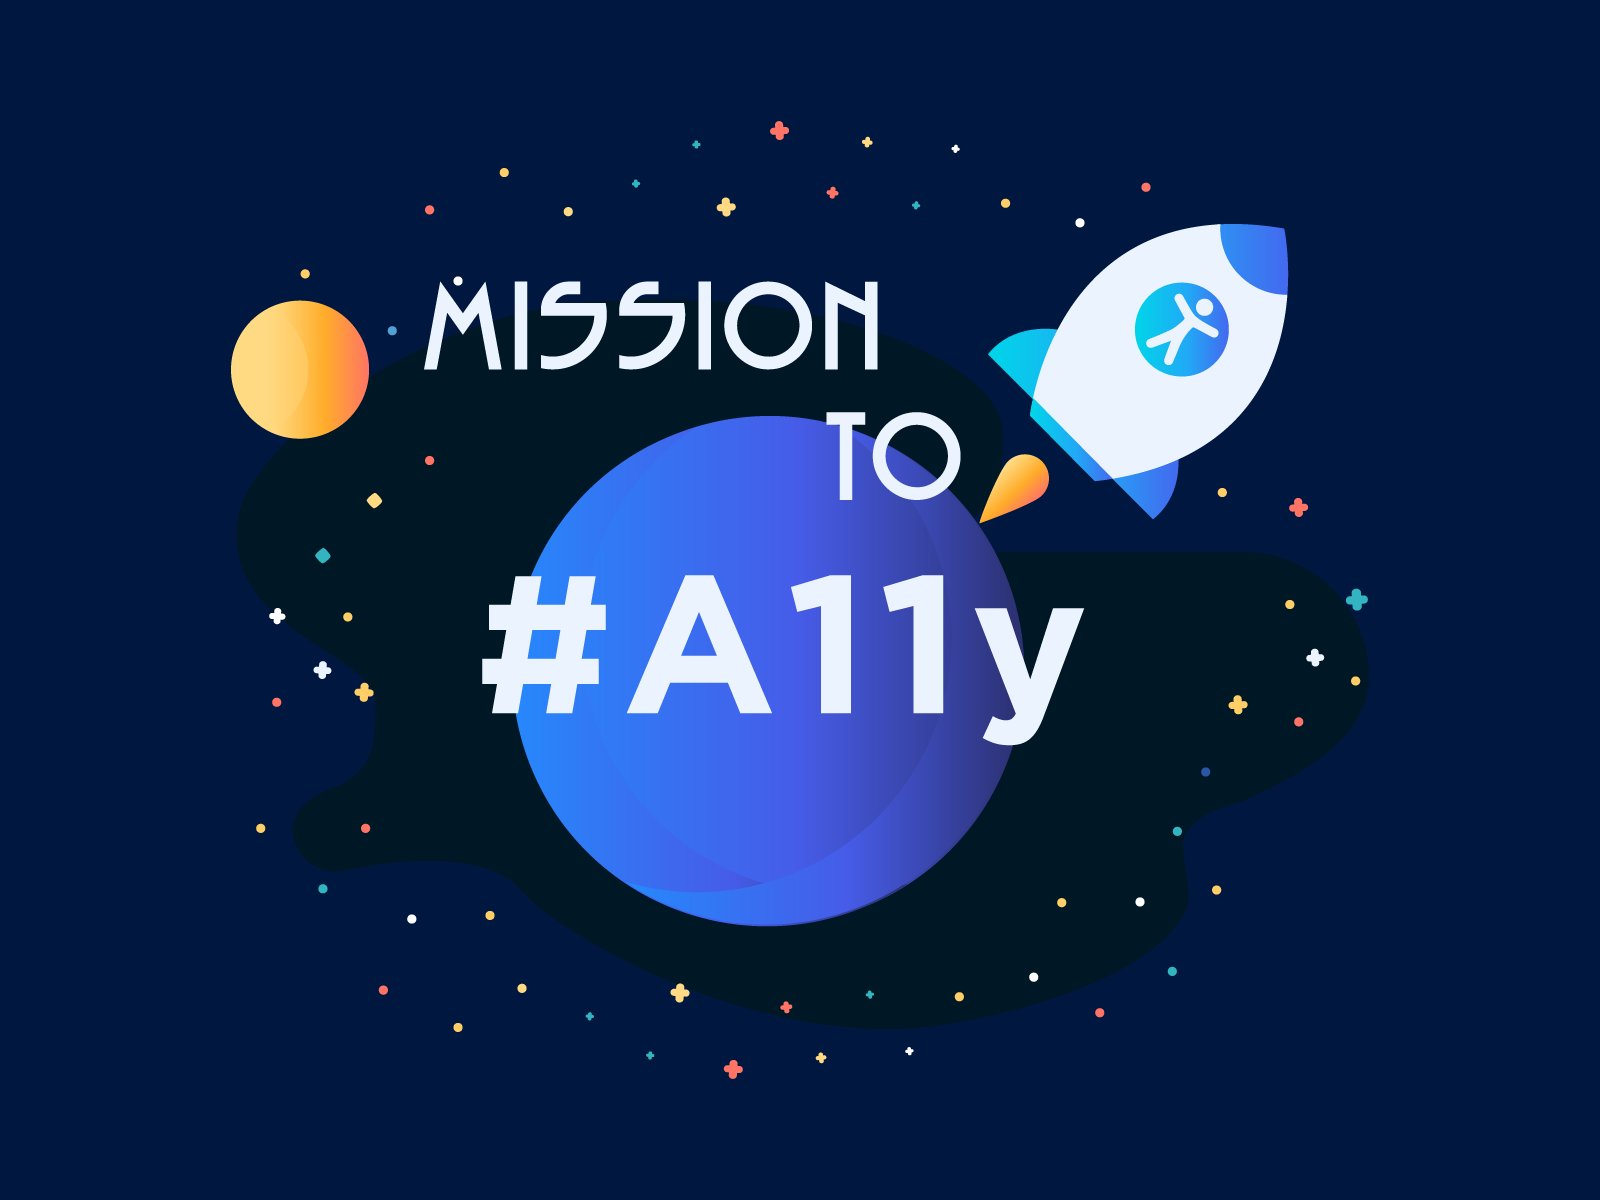 Missiona11y